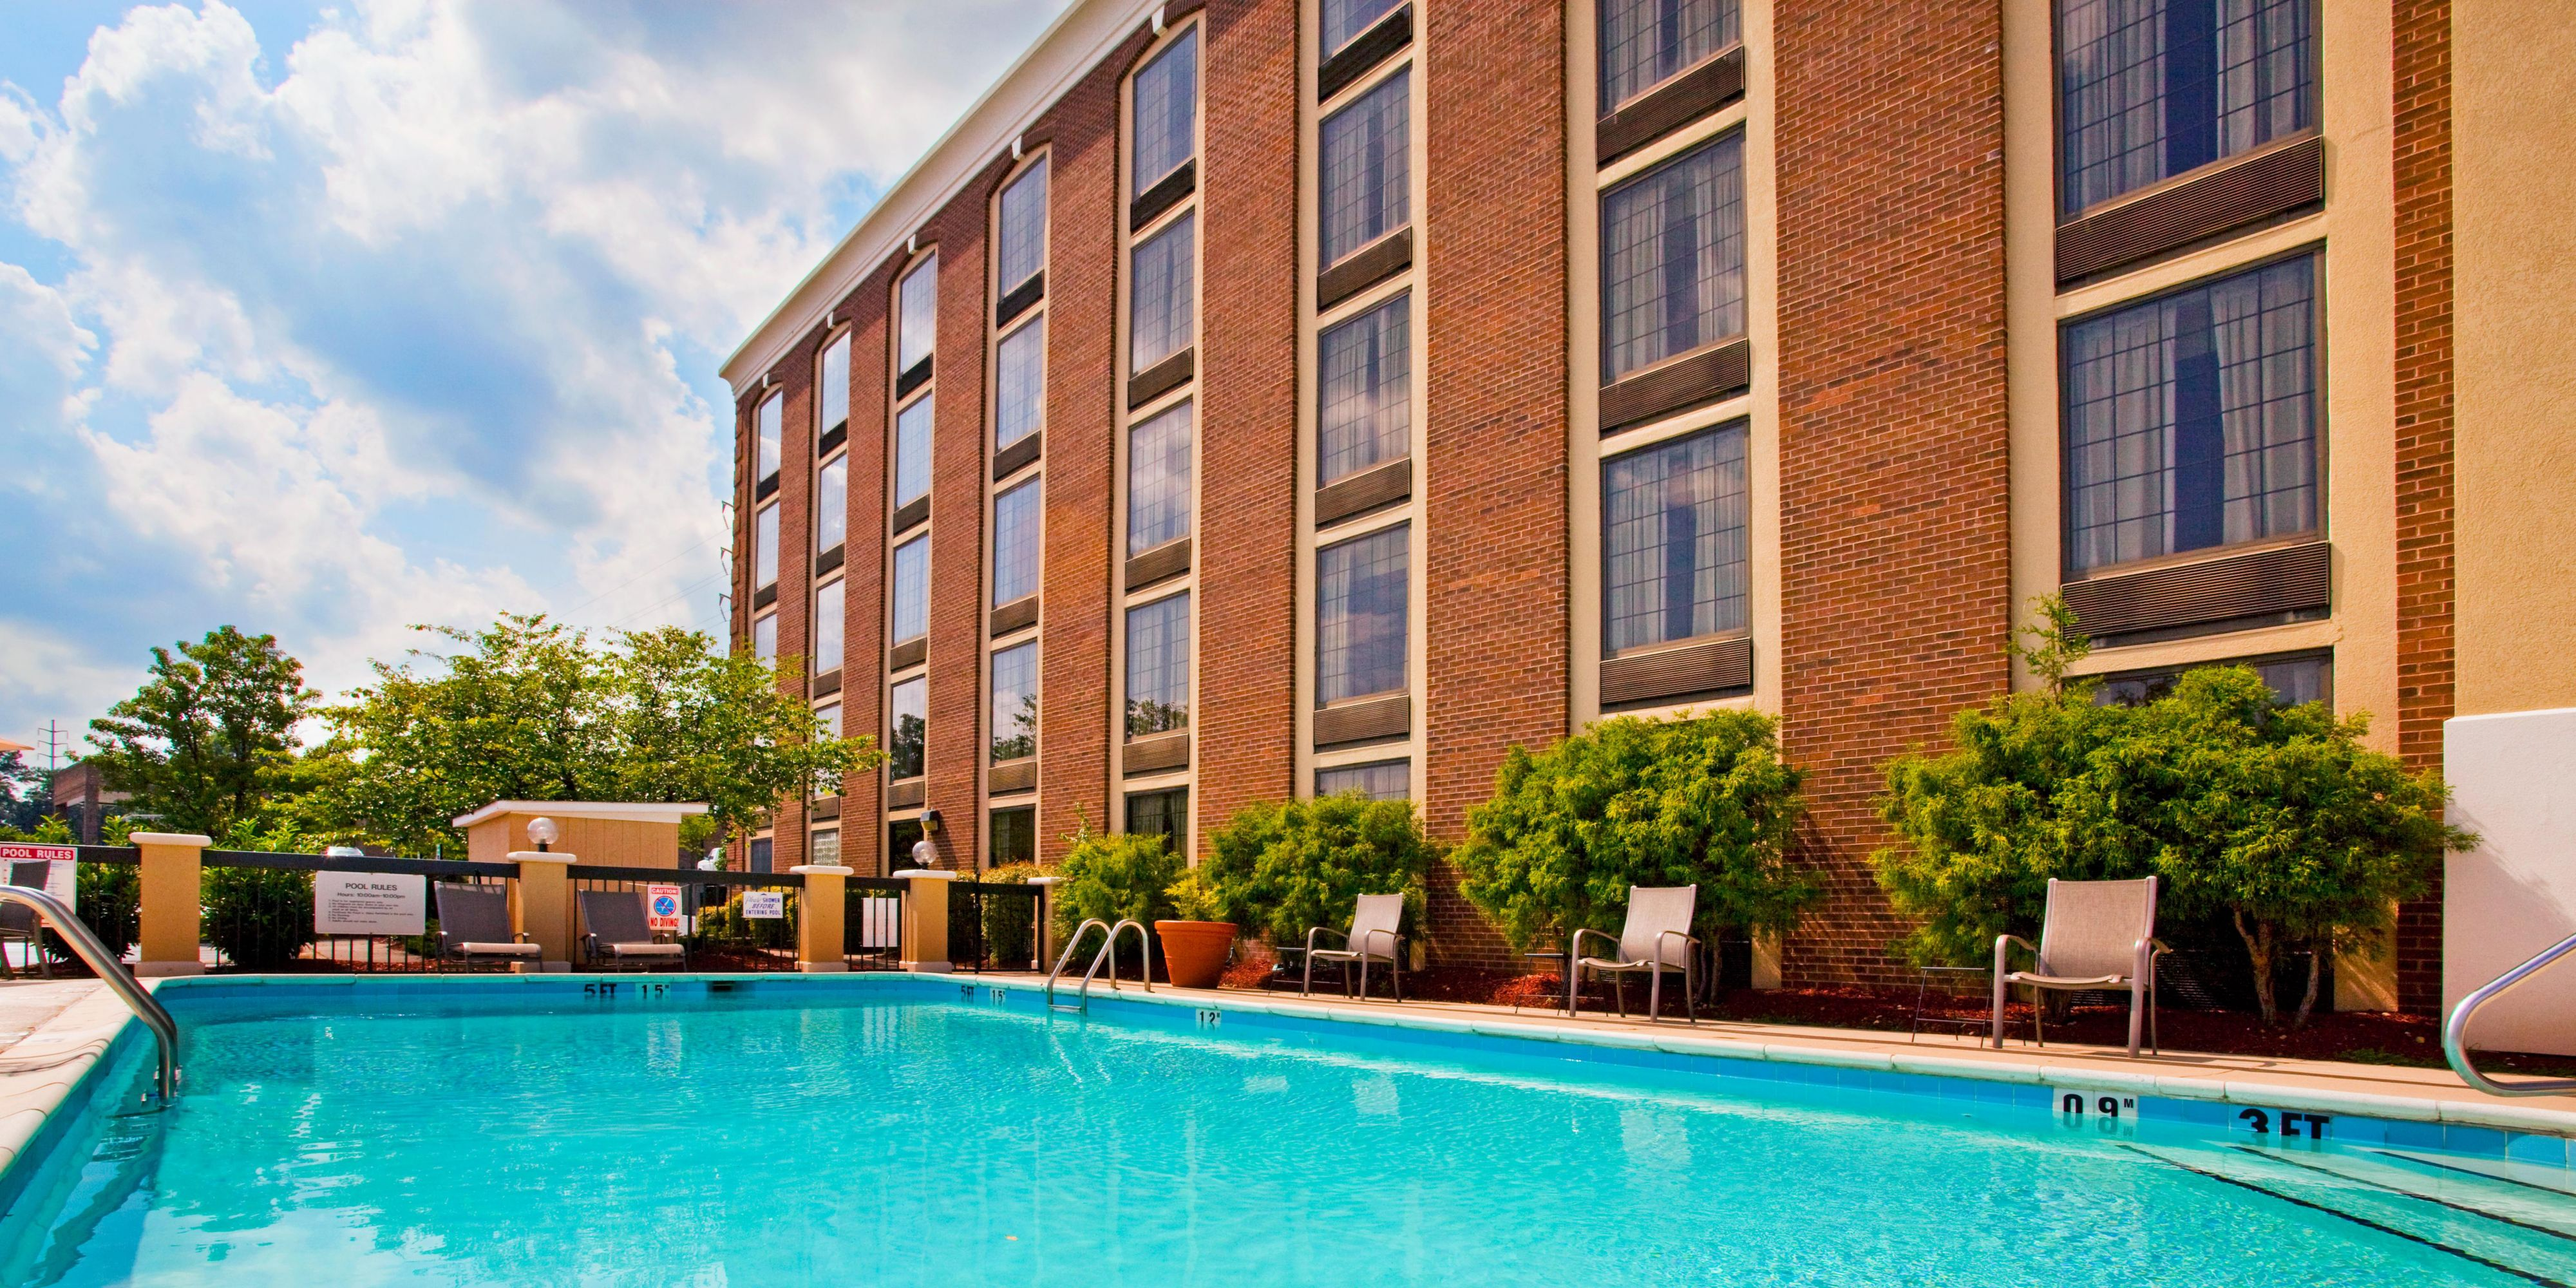 Romantic hotels in winston salem nc 2018 world 39 s best hotels for Hilton garden inn winston salem